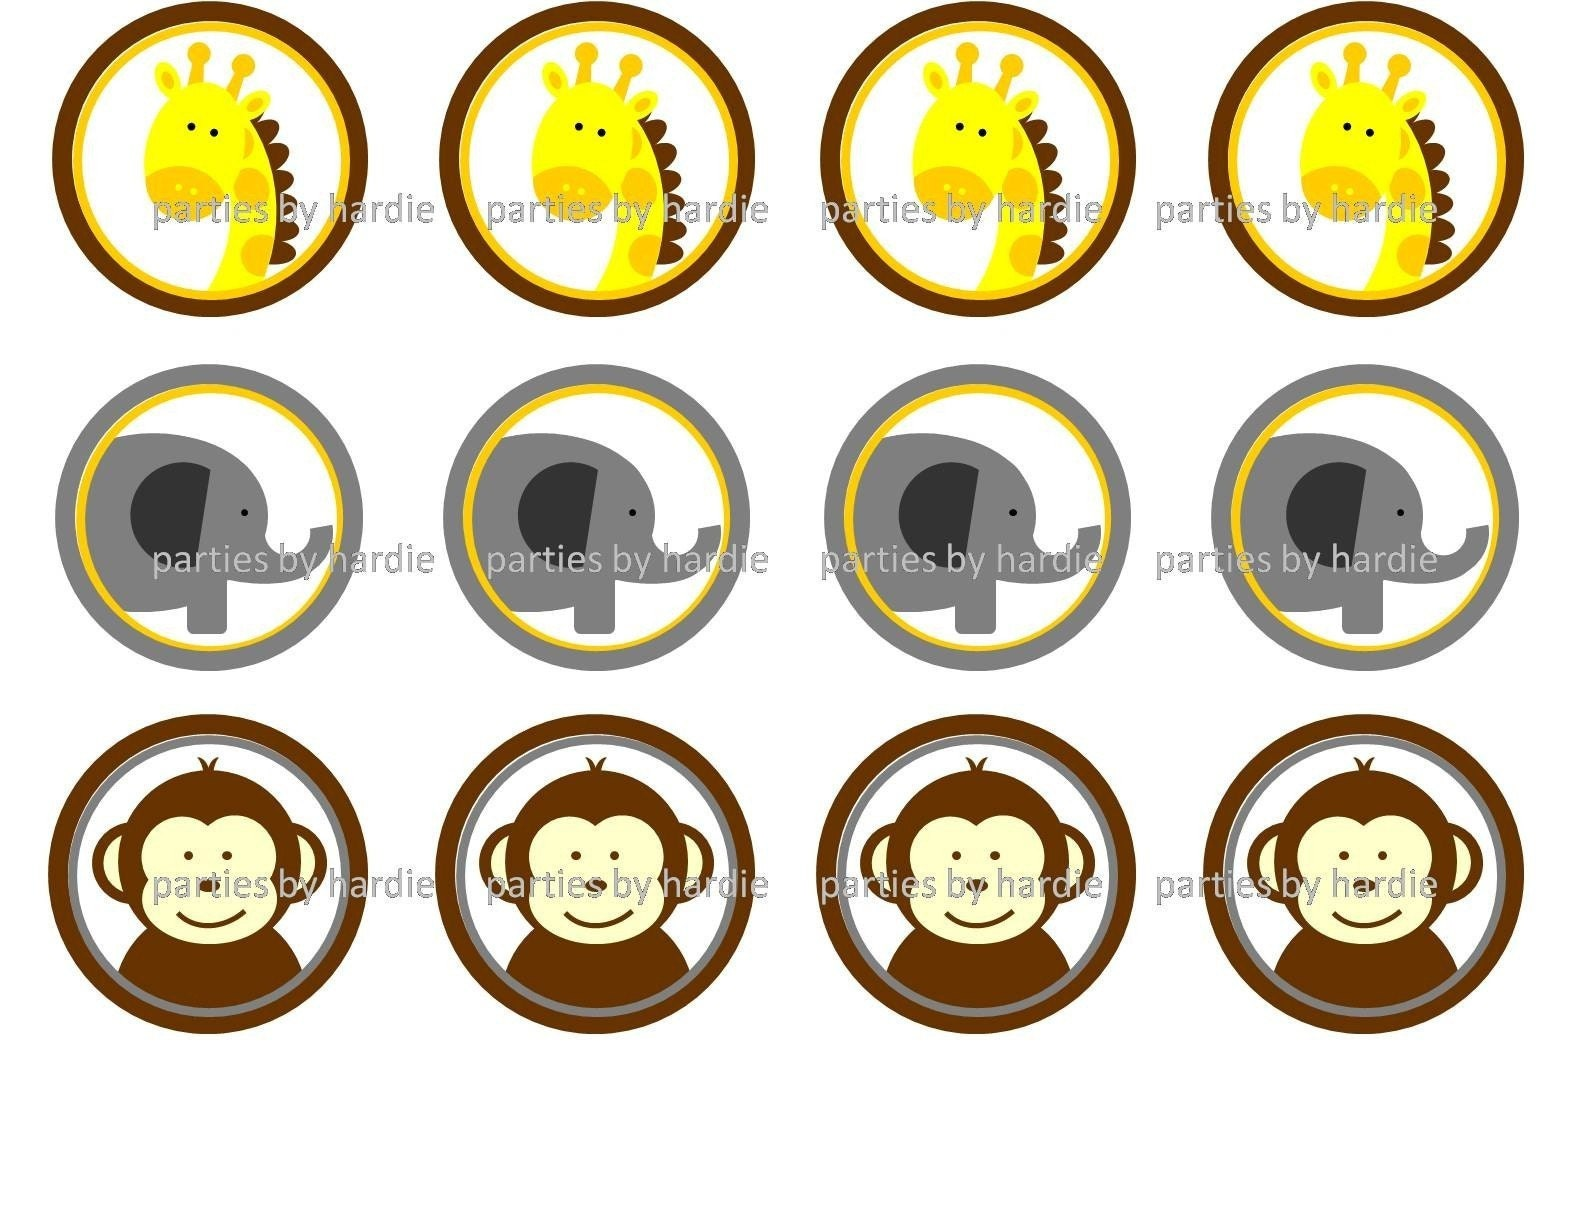 Printable PDF Safari/Zoo Party Round Tags by nickwilljack on Etsy